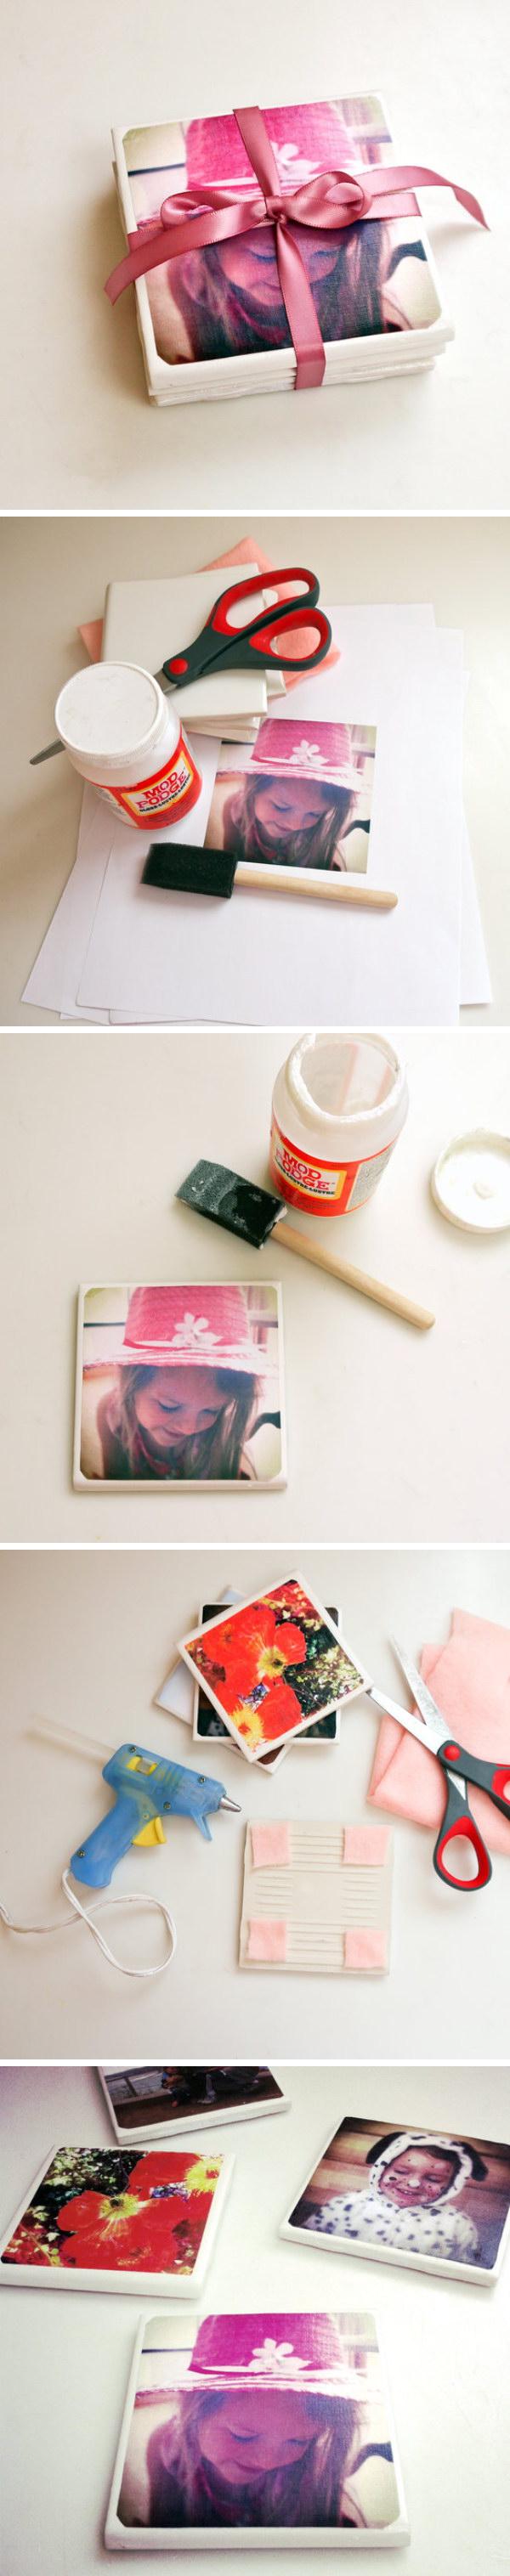 DIY Tile Photo Coasters.